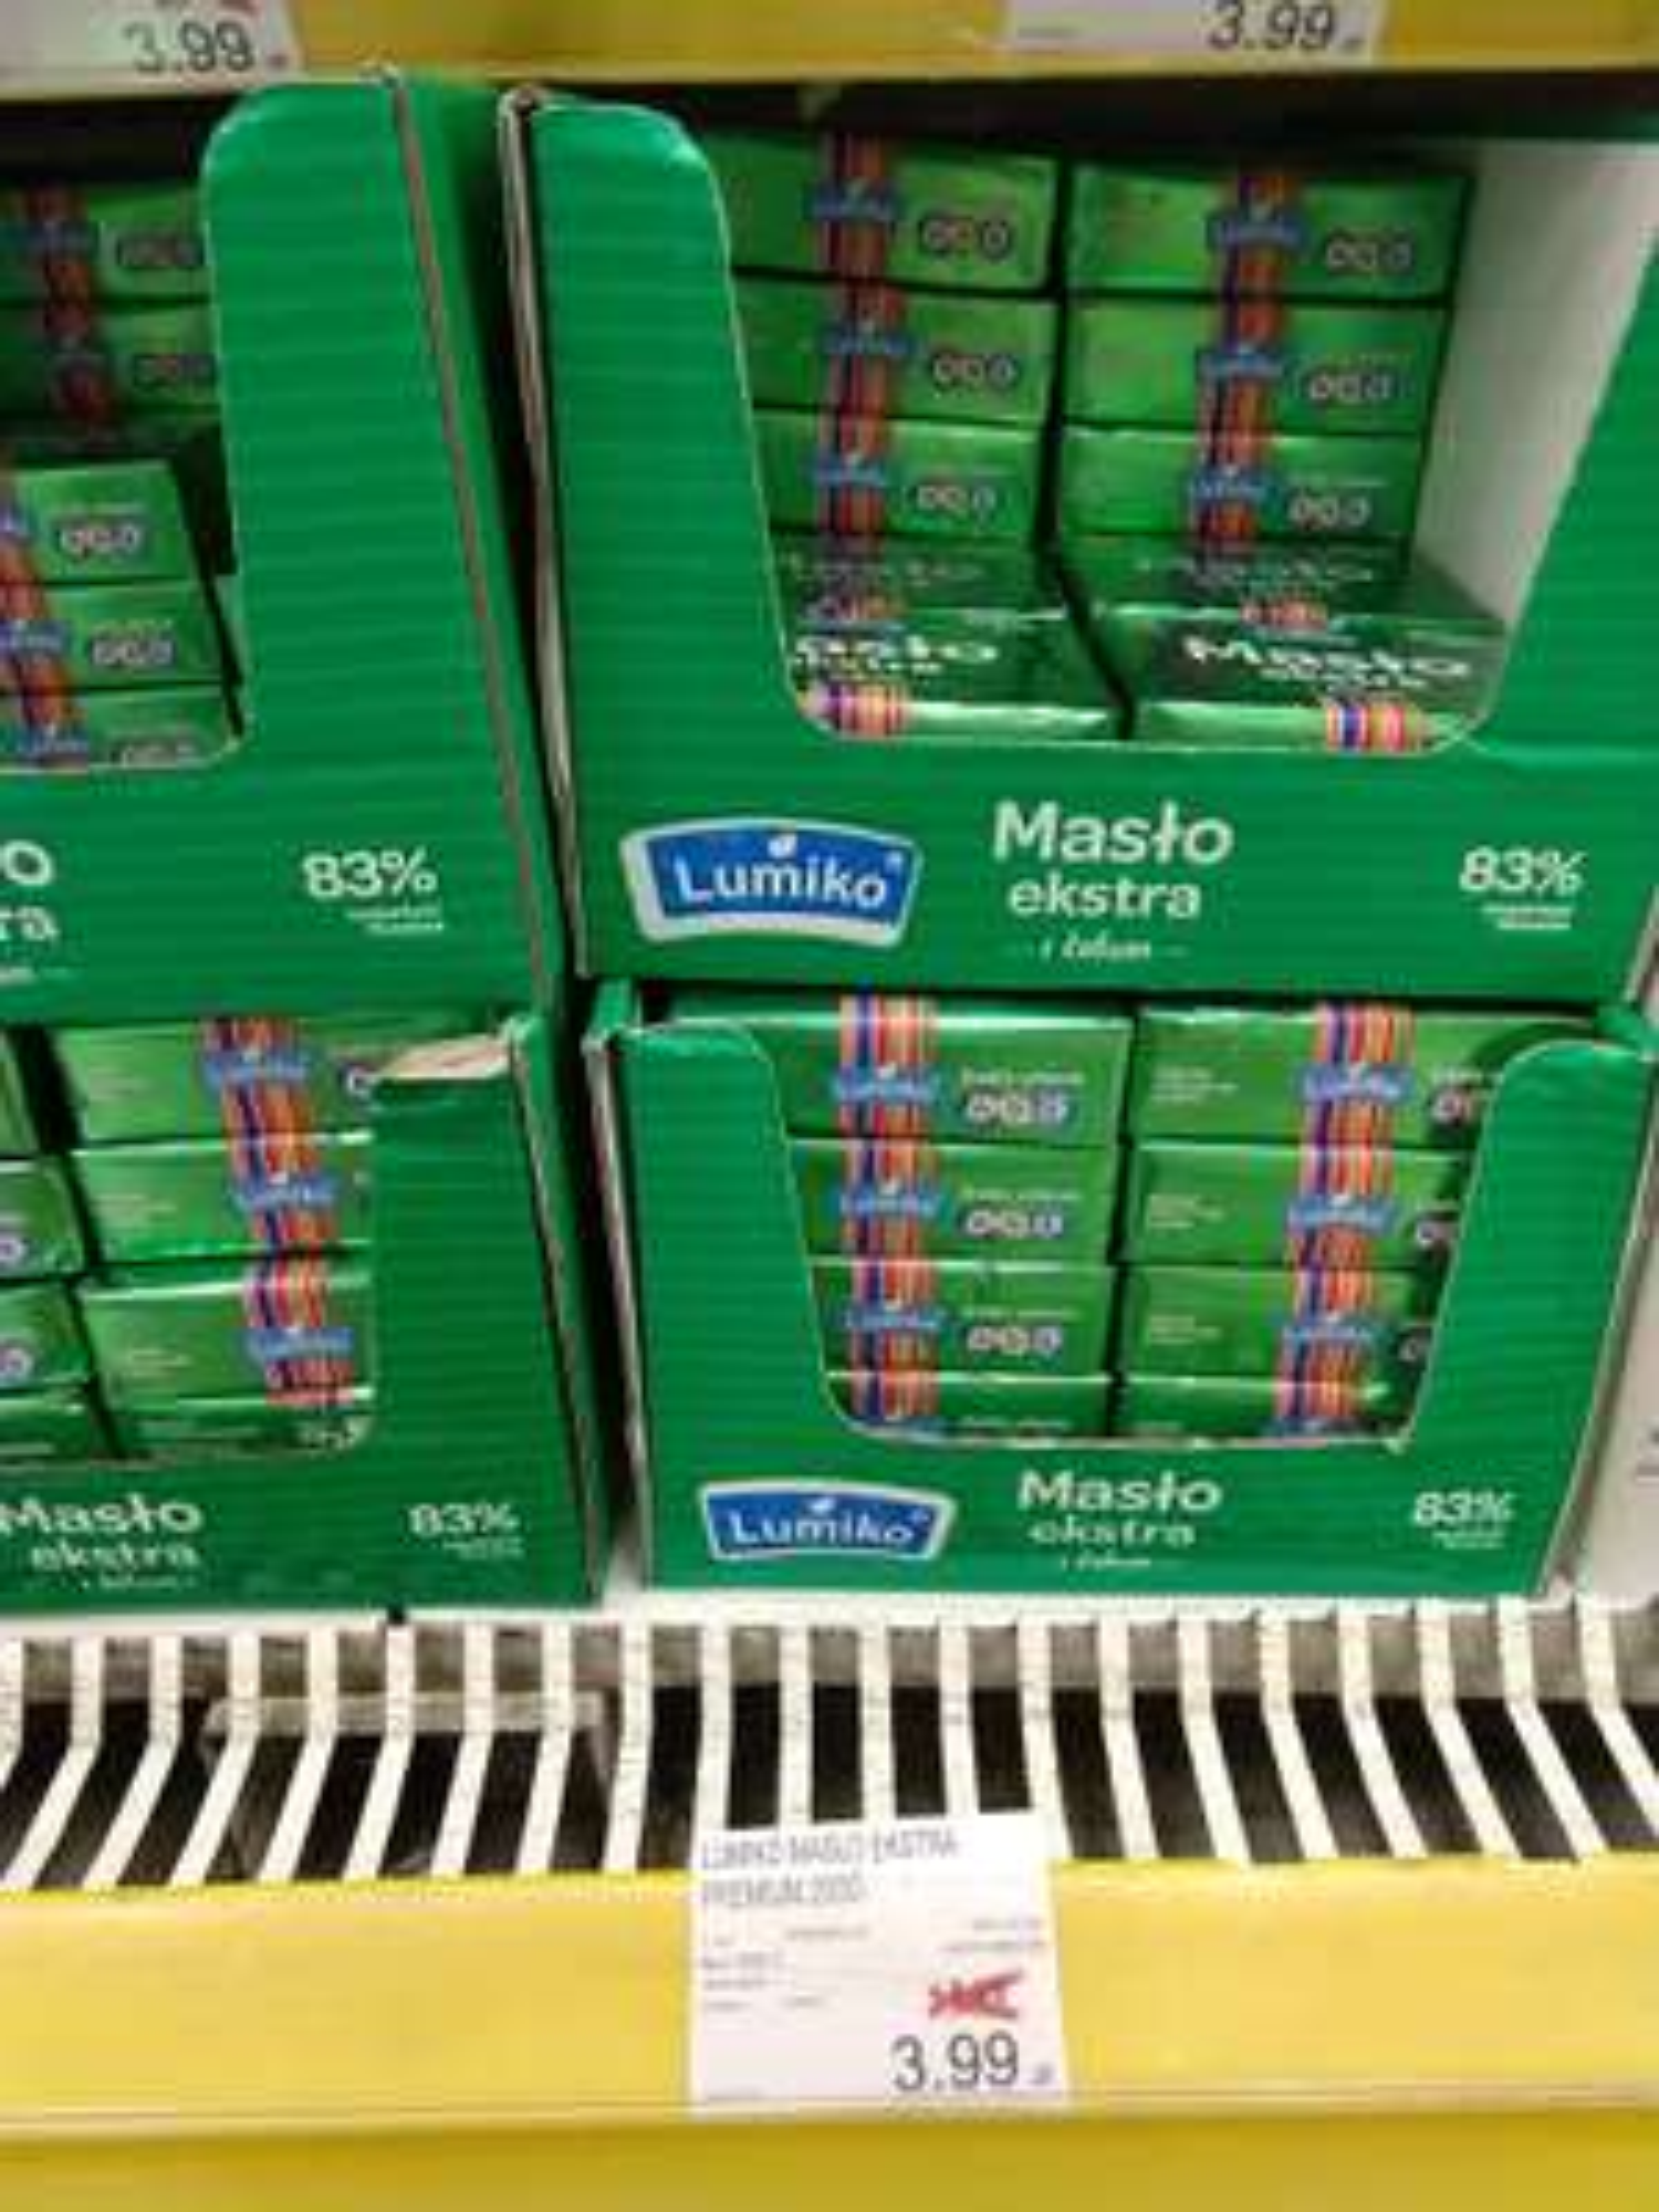 Lumiko Masło Extra 83% Premium 200g @ E.Leclerc